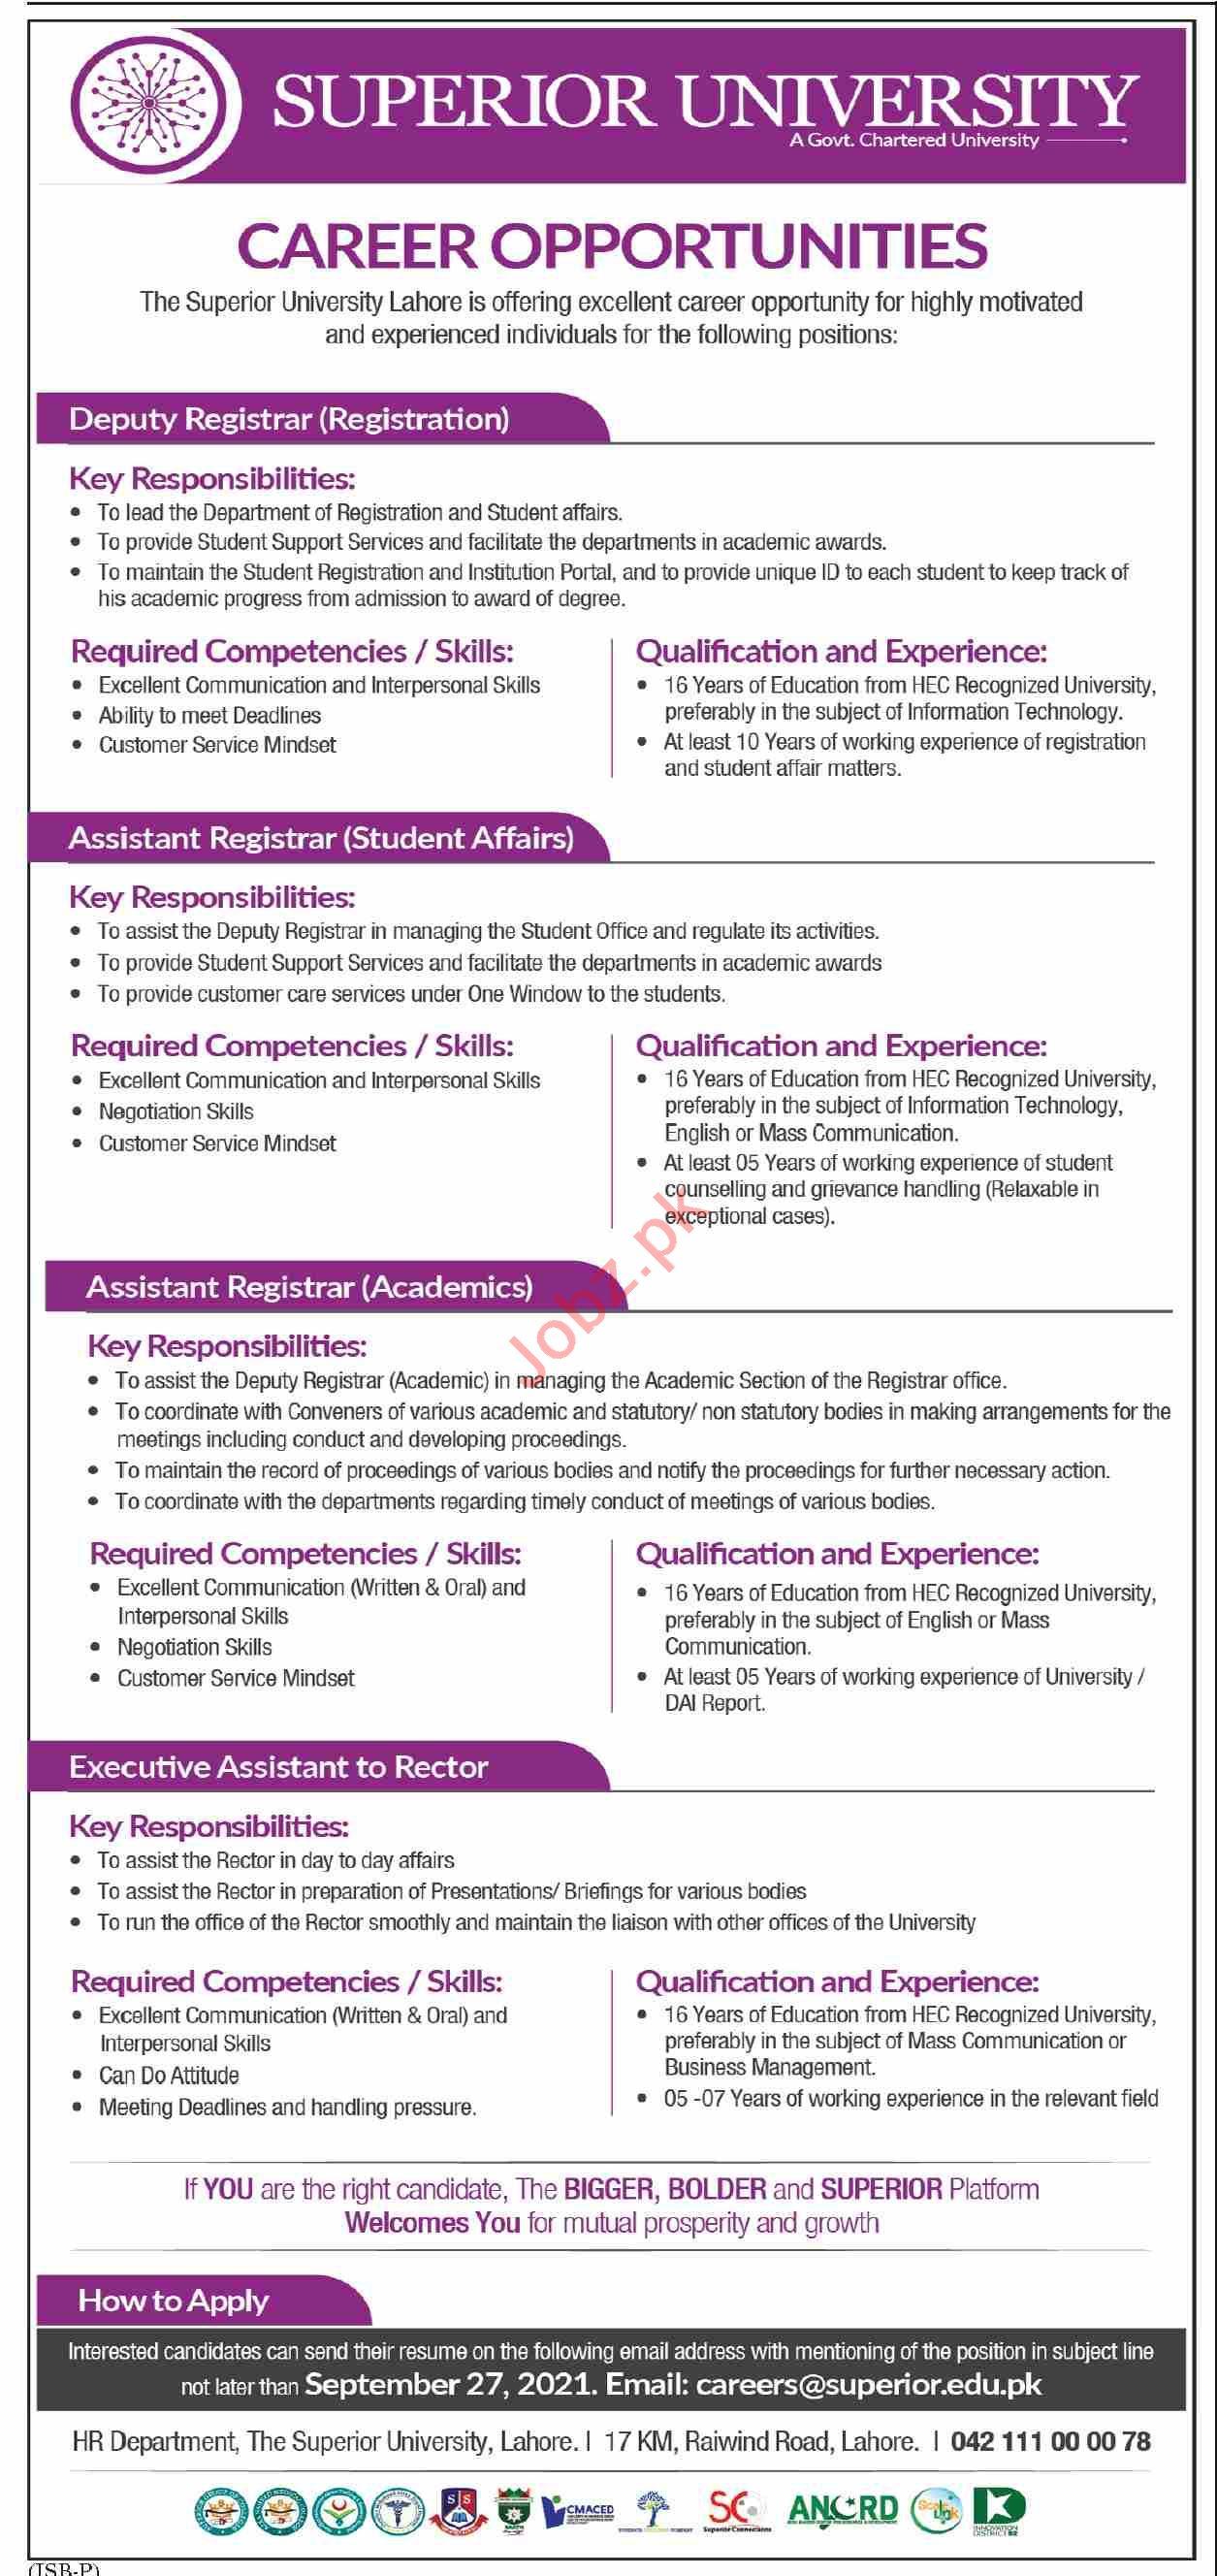 Superior University Lahore Jobs 2021